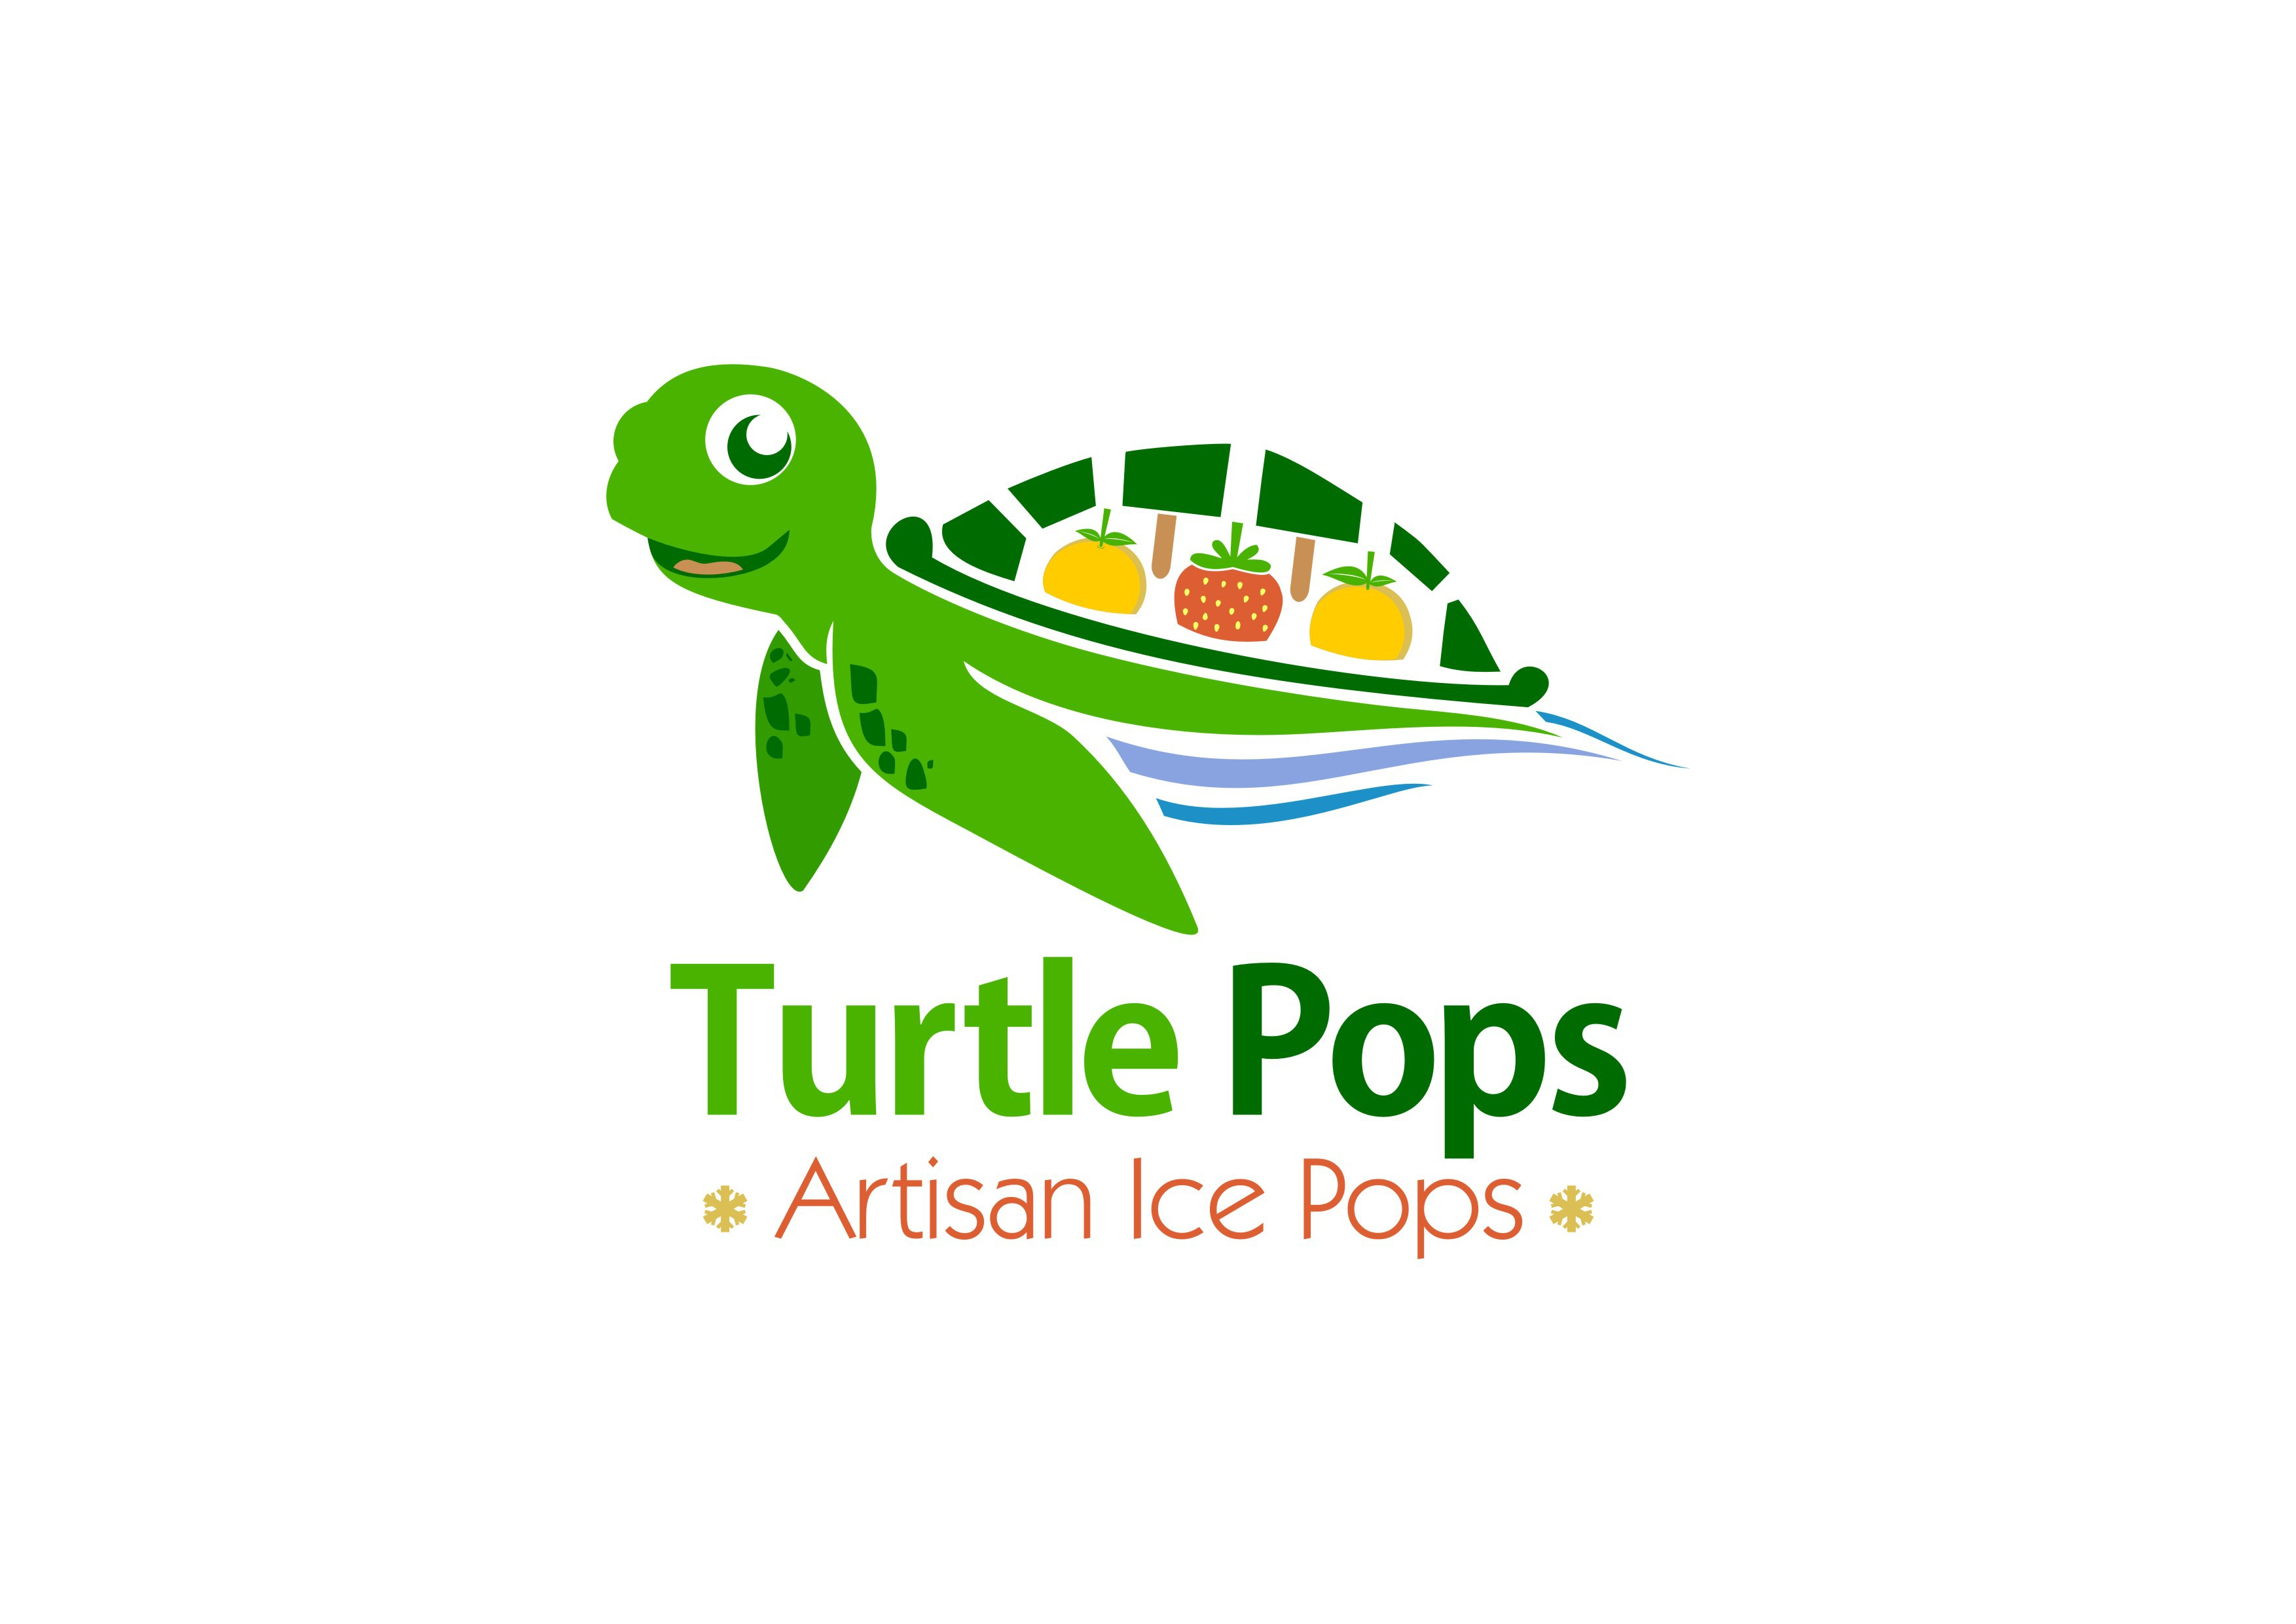 Create a fun sea turtle icon incorporating our company name, Turtle Pops